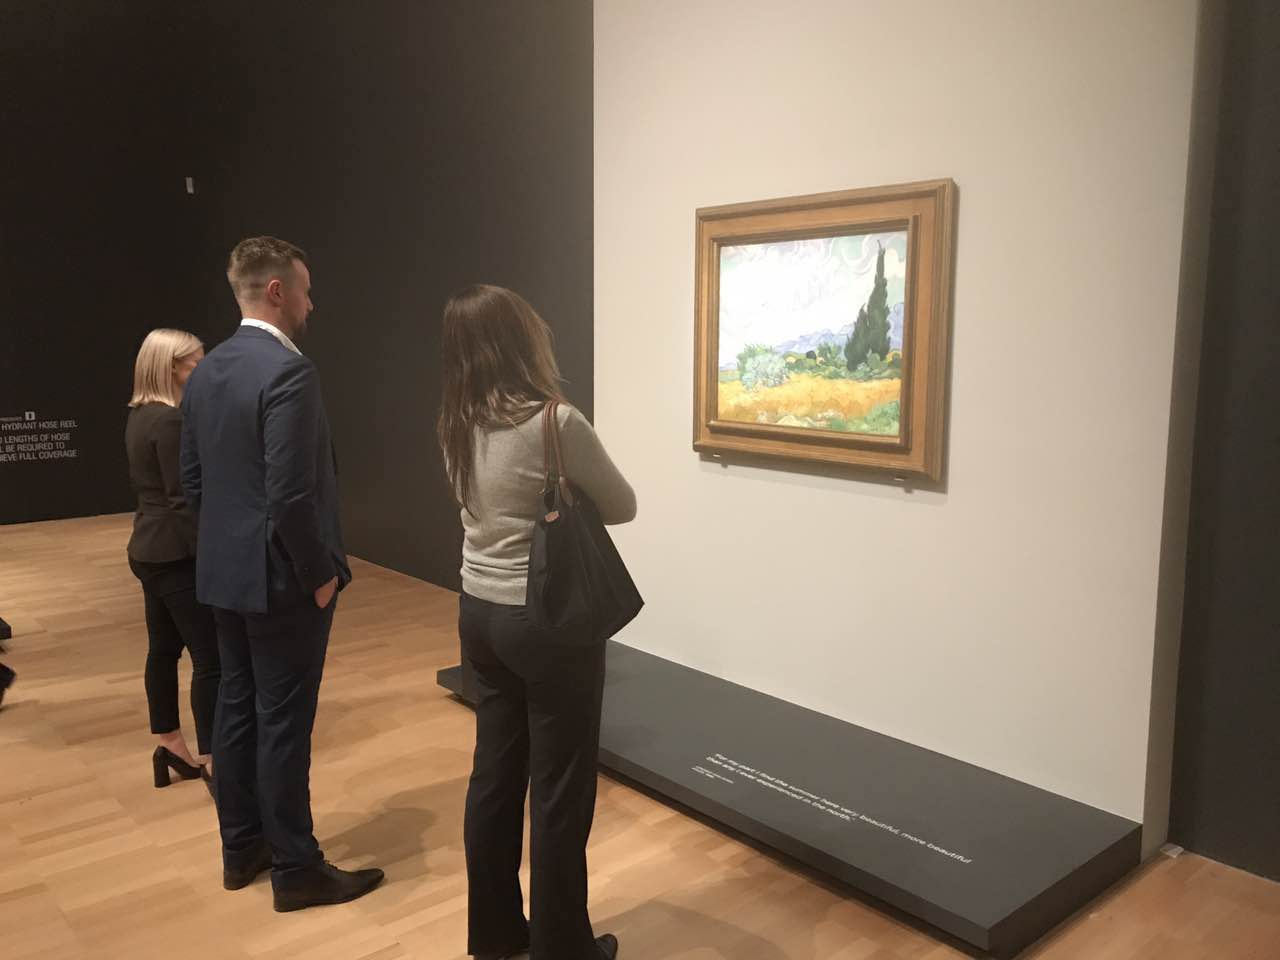 - Admiring the Art of Van Gogh